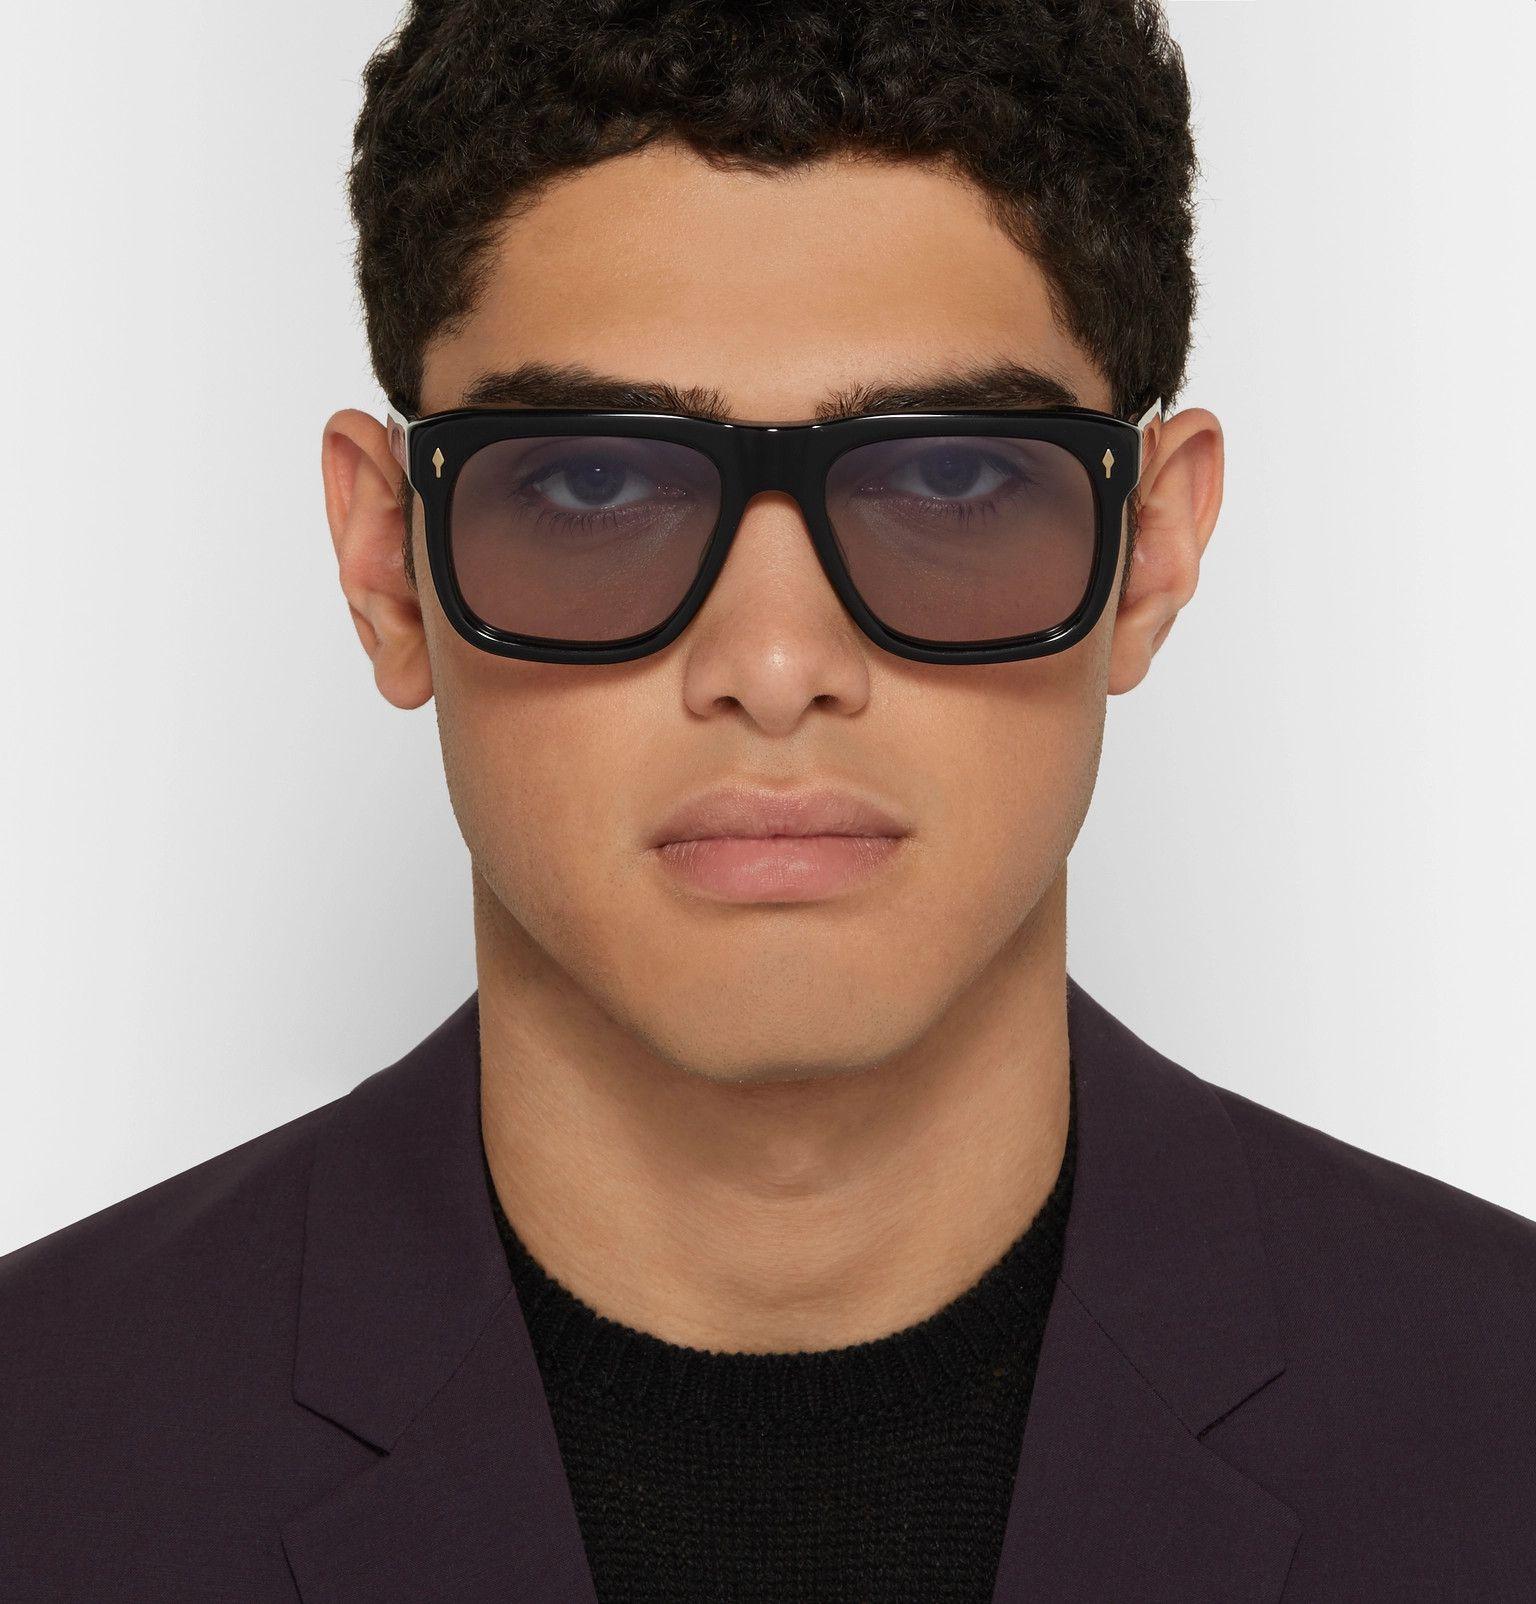 Jacques Marie Mage Yves Square Frame Acetate Sunglasses In Black Modesens Men Sunglasses Fashion Square Frames Sunglasses